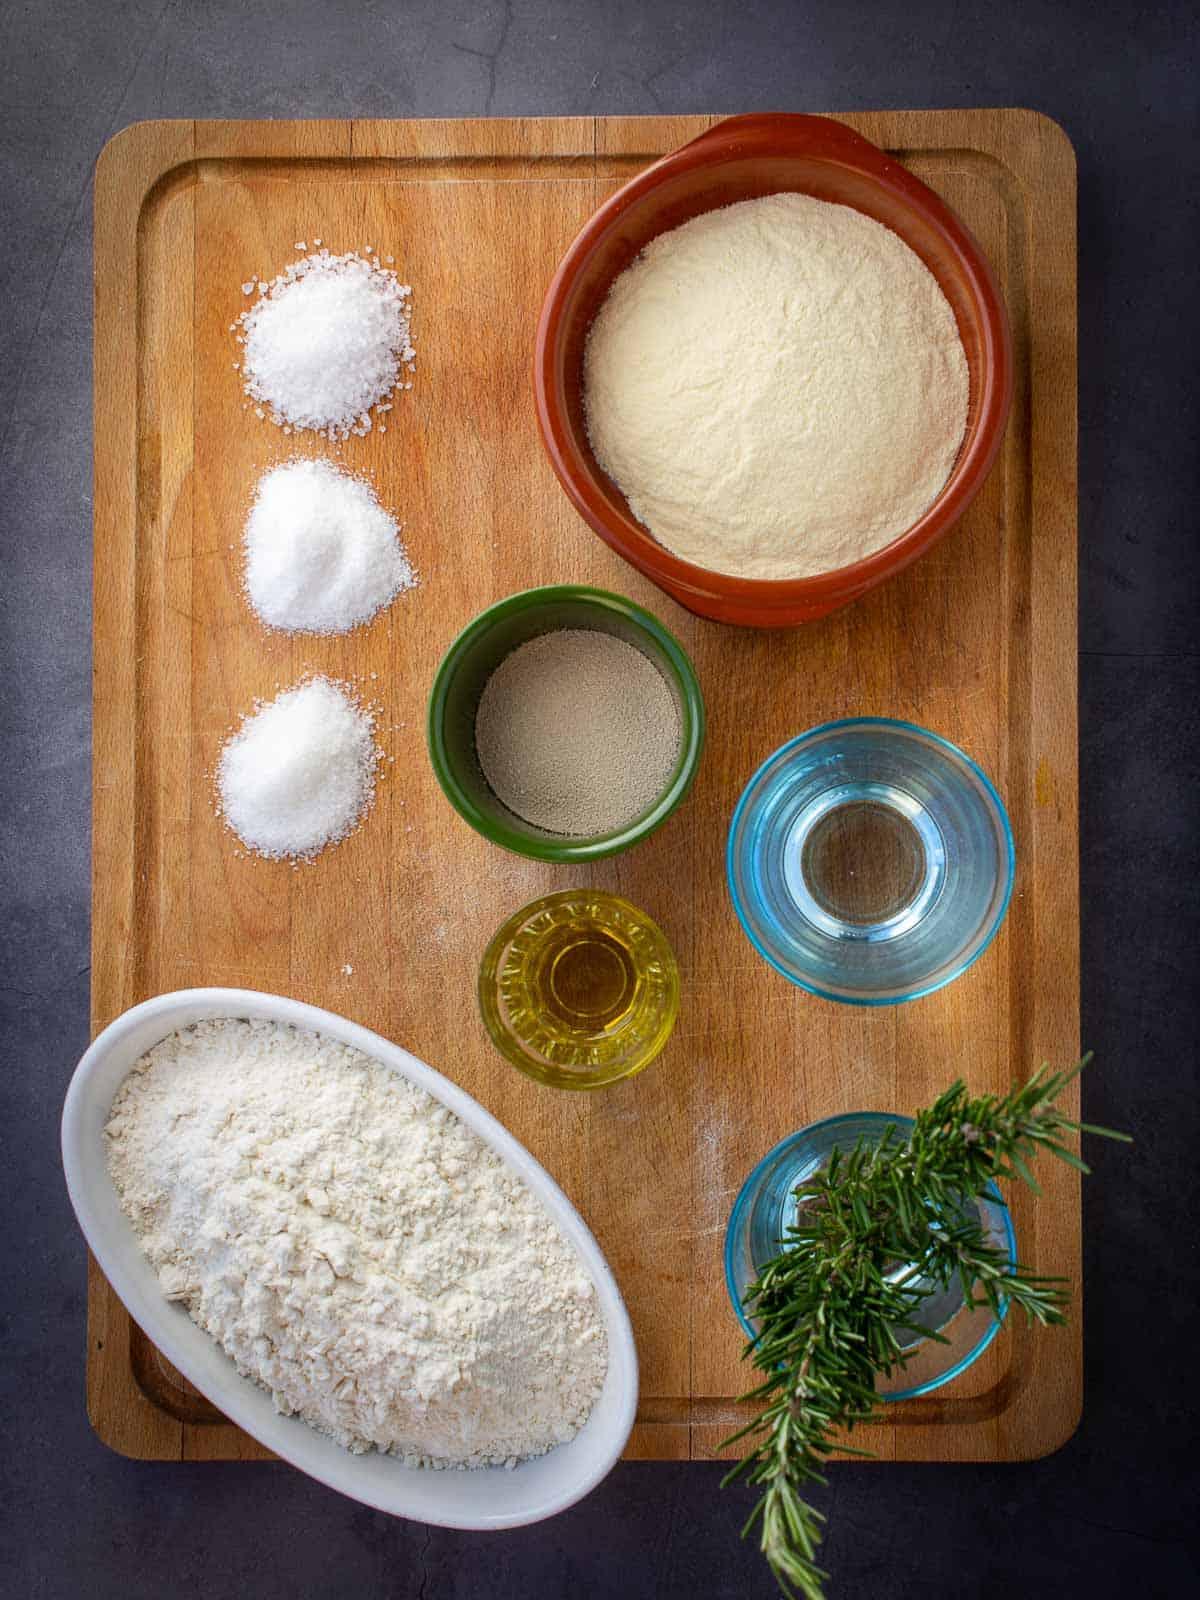 focaccia ingredients